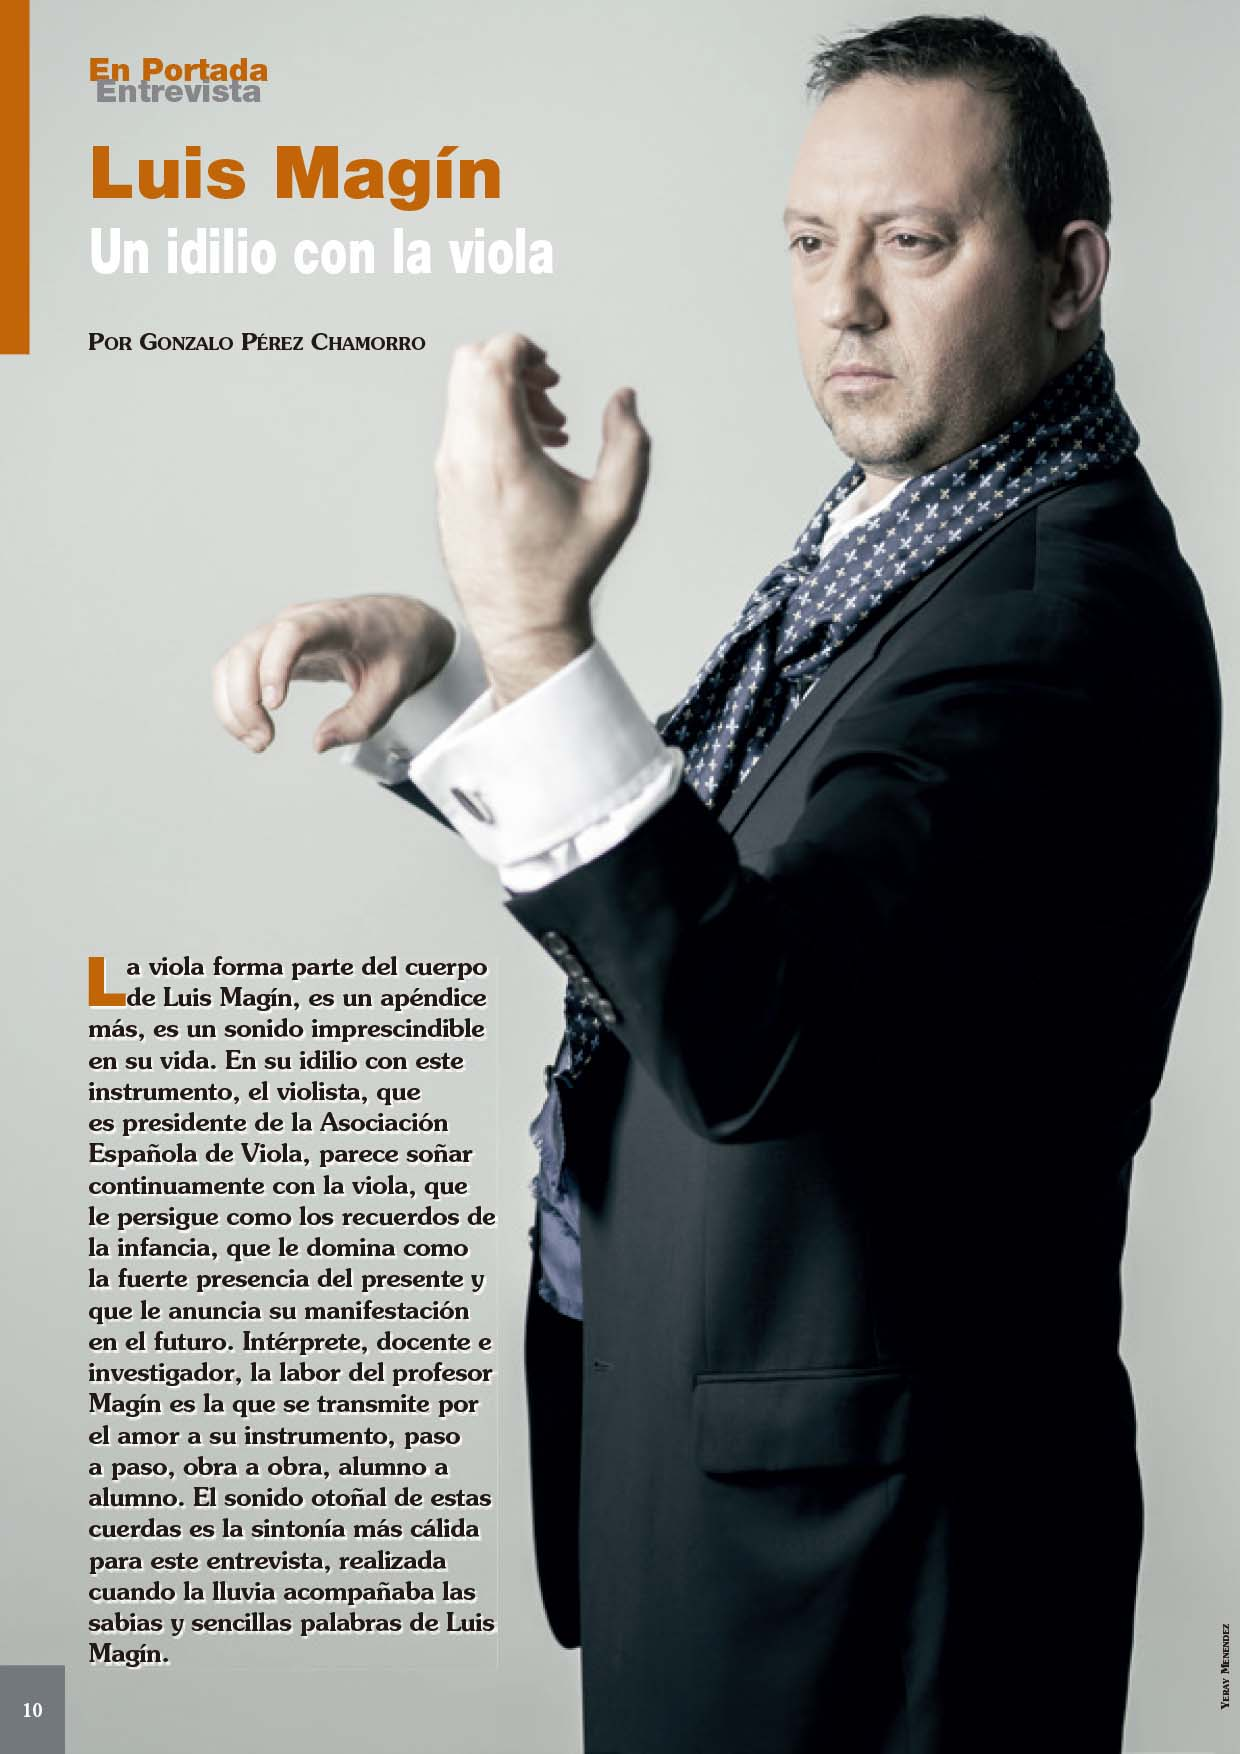 16-02-01-Luis-Magin-Ritmo-8